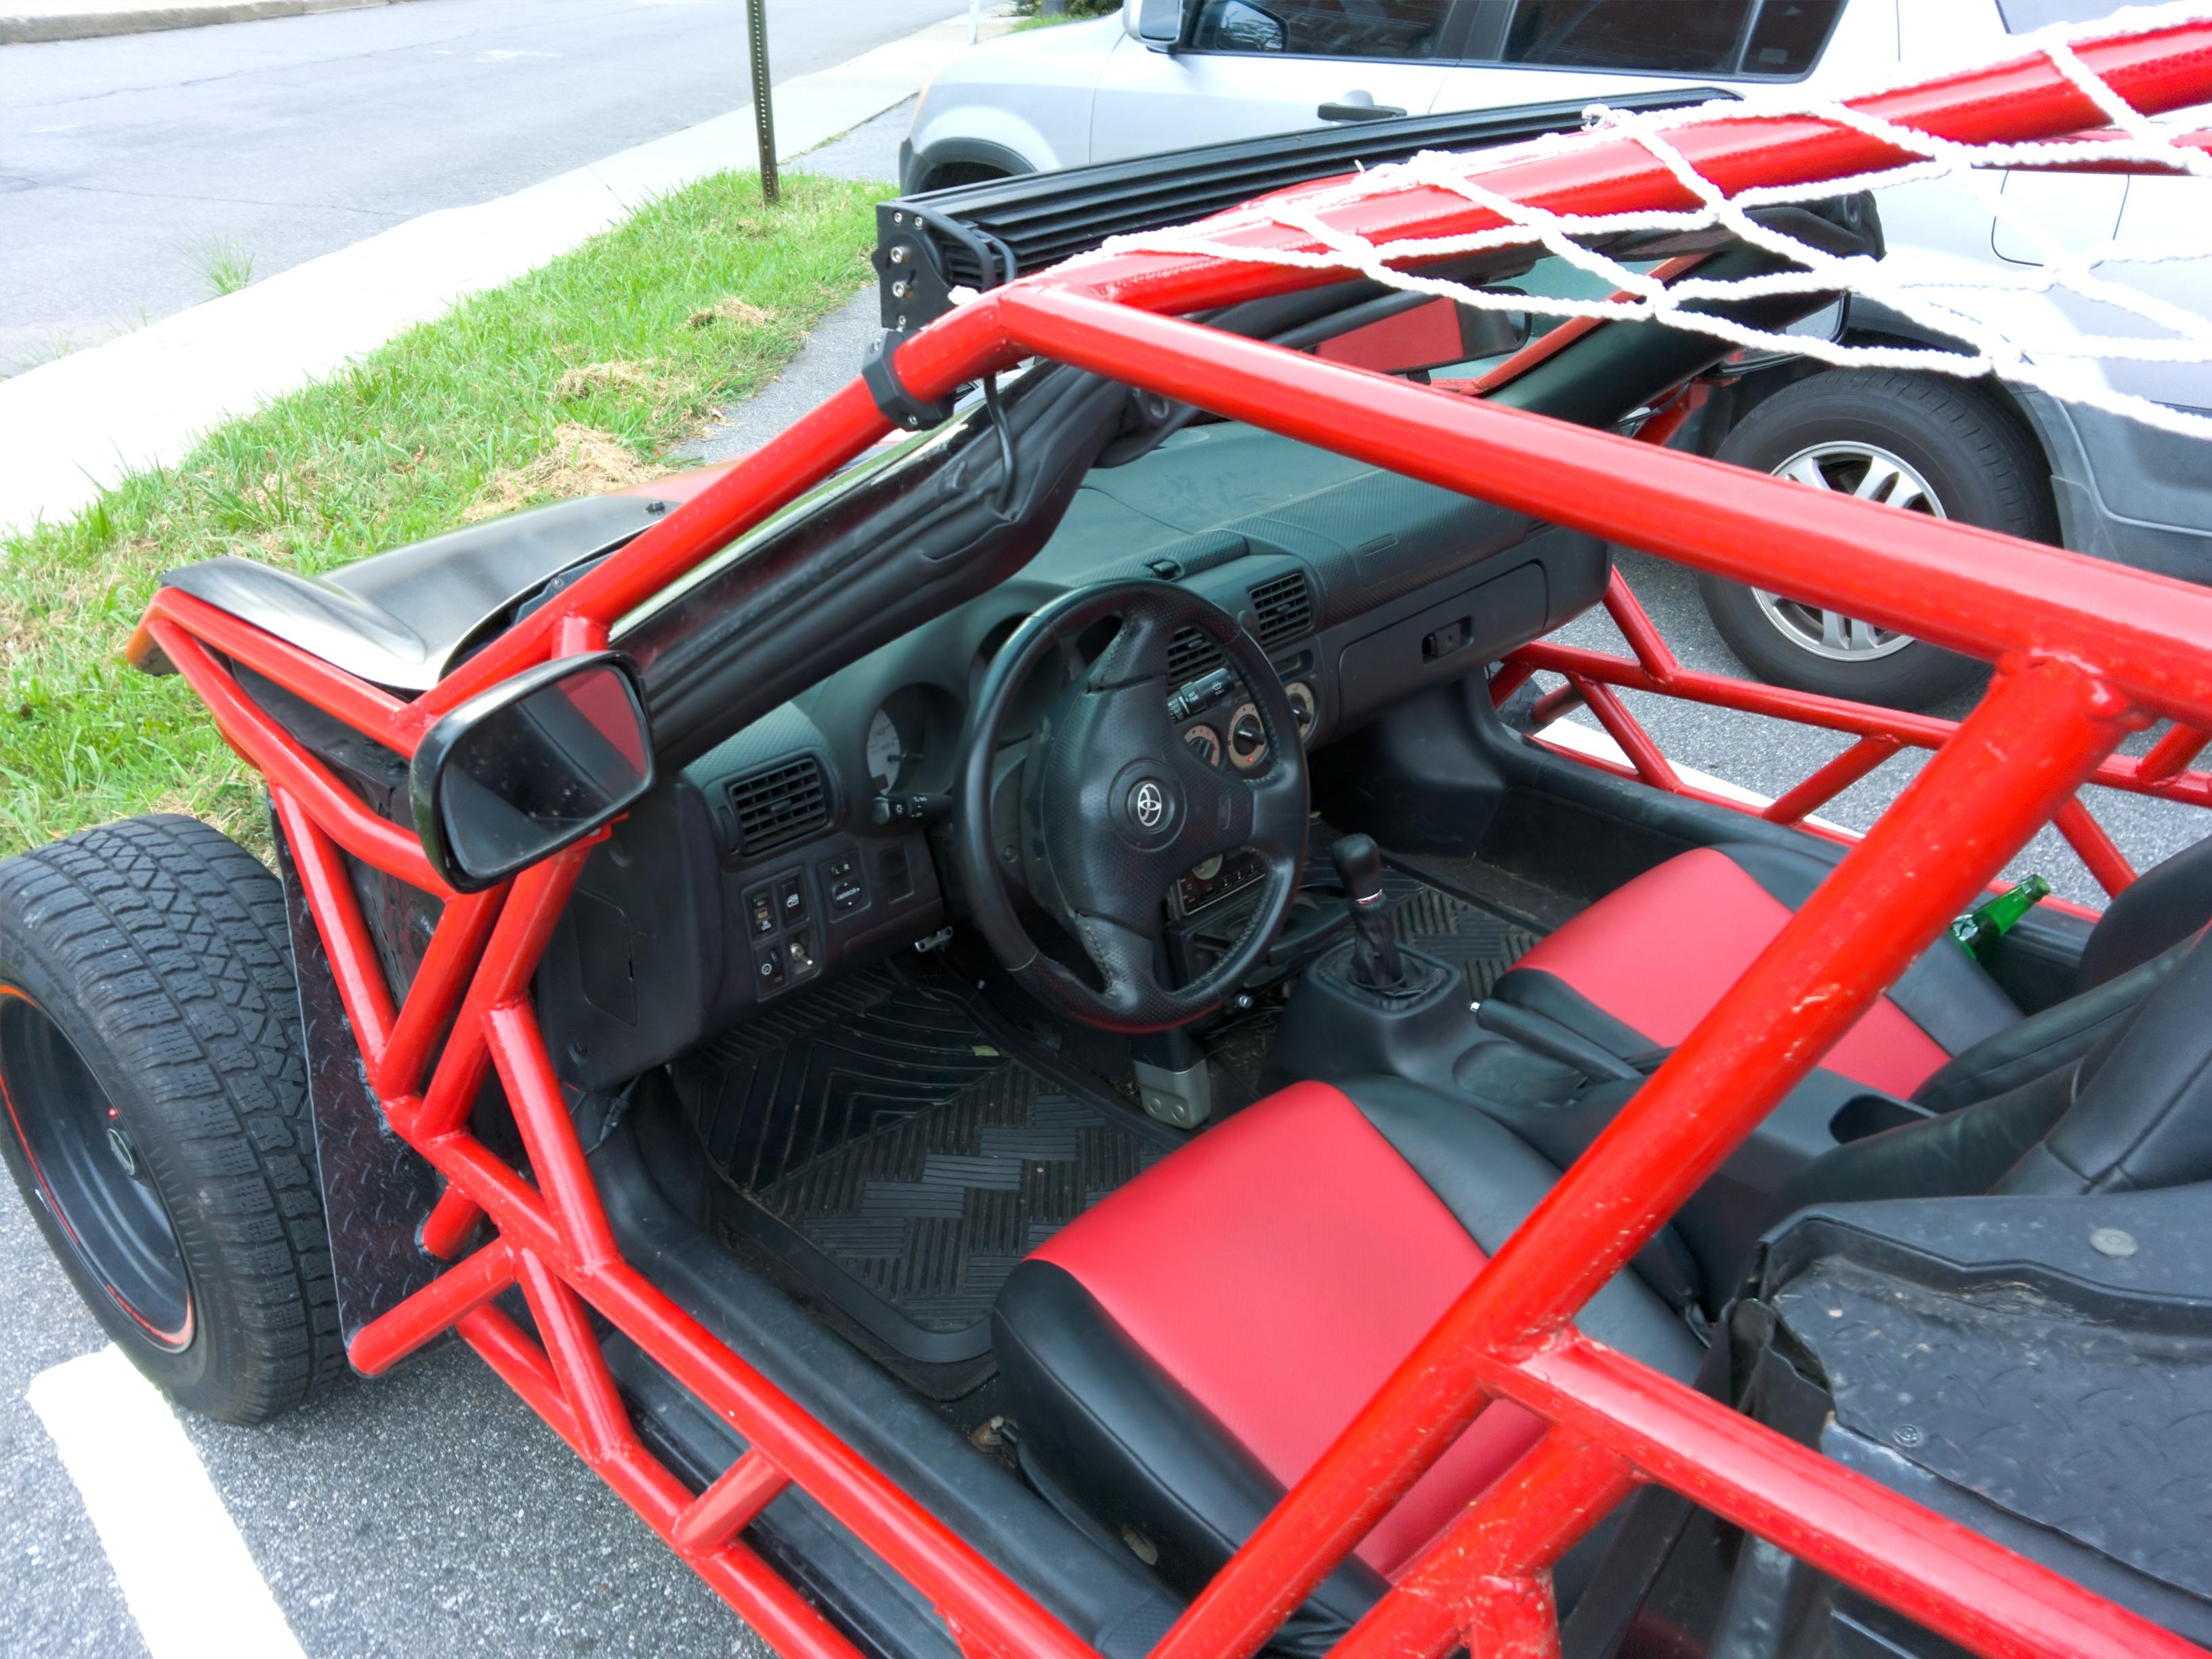 File:Toyota Spyder Dune Buggy jpg - Wikimedia Commons